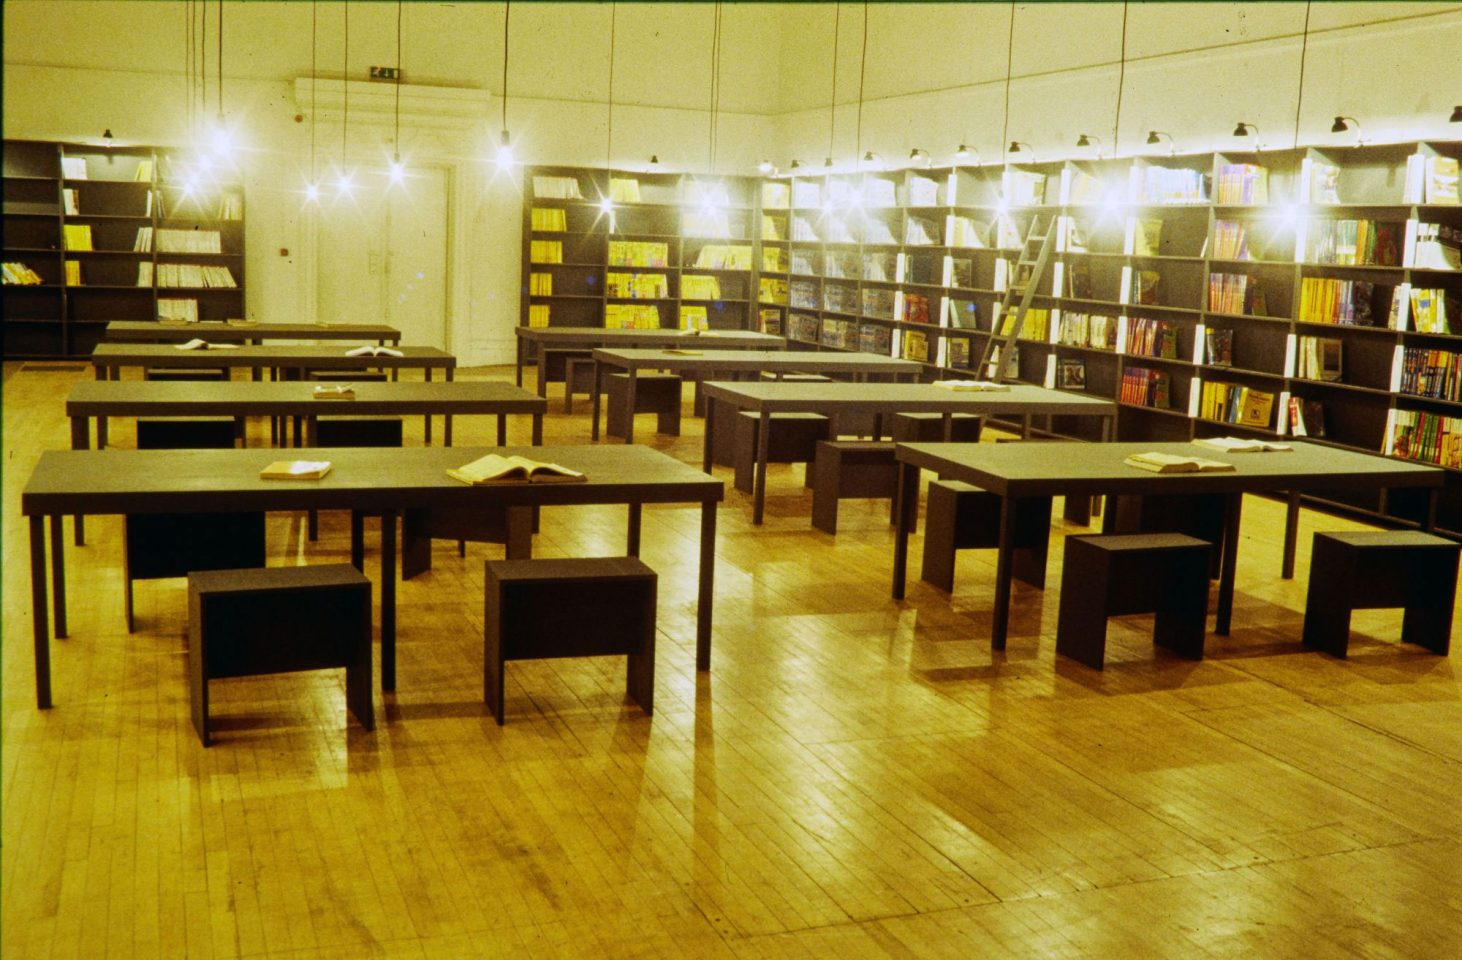 Installation view of Christian Boltanski's Les Abonnes du Telephone.